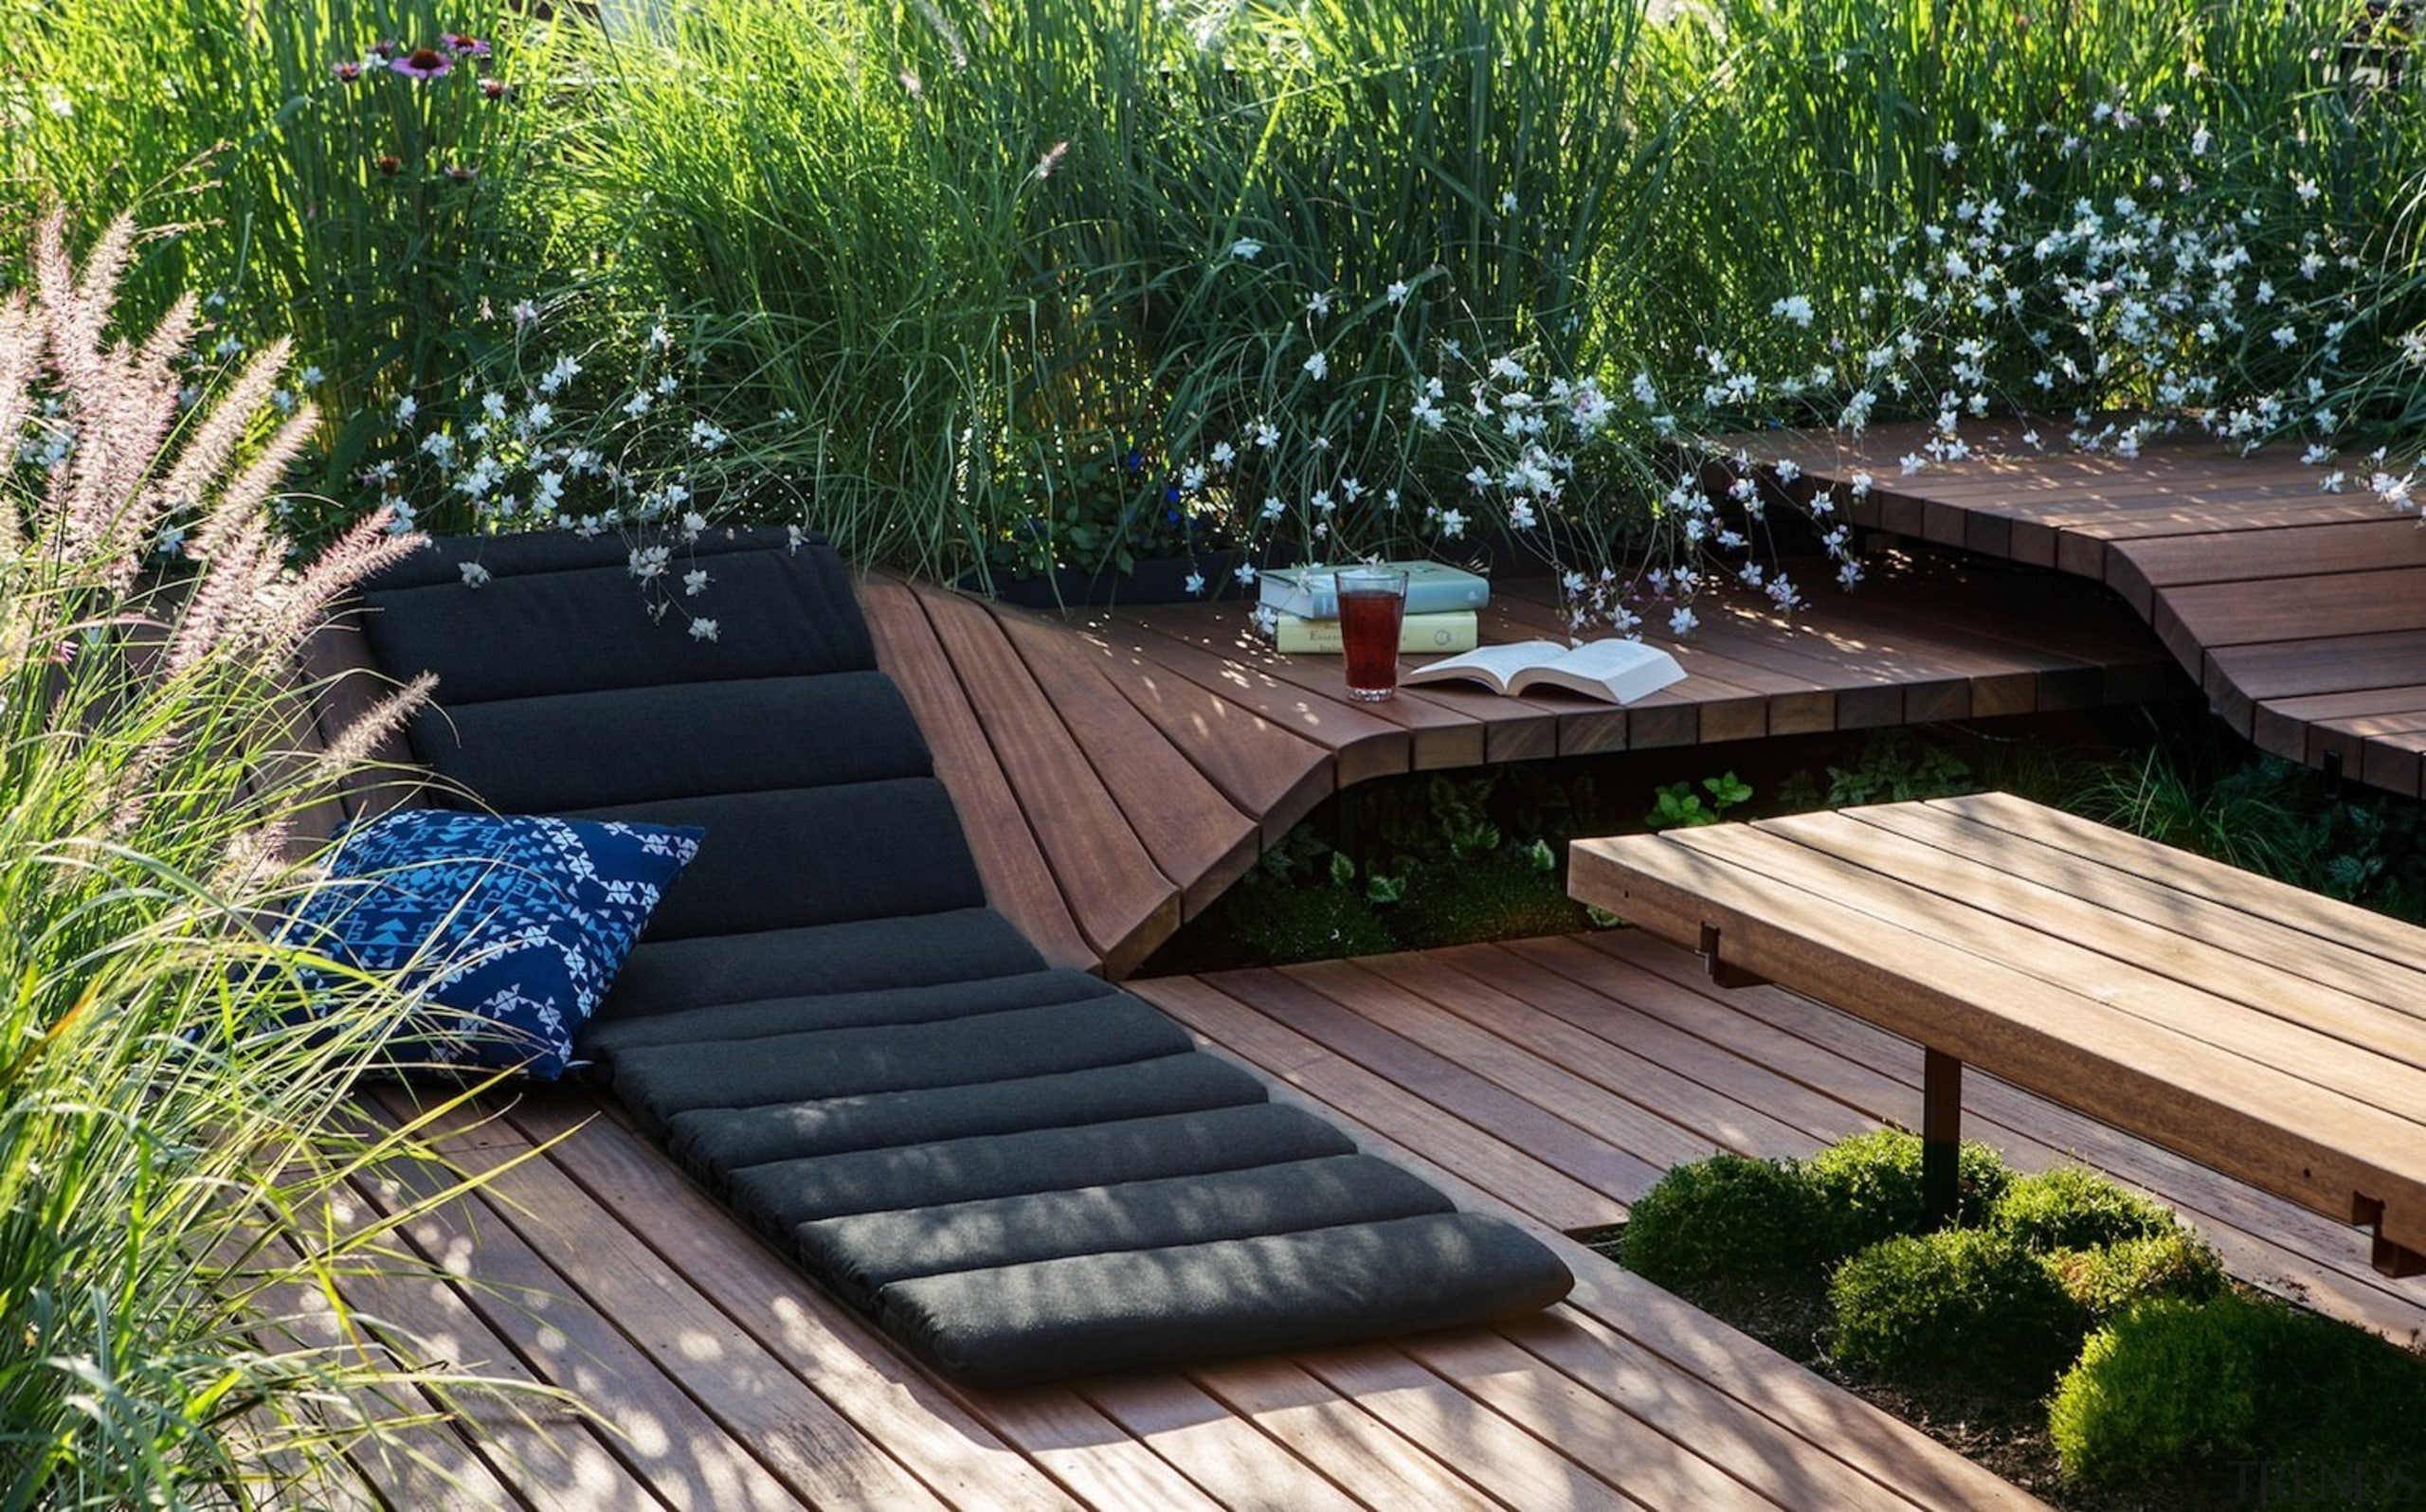 Architect: J.Roc Design backyard, deck, grass, outdoor furniture, outdoor structure, plant, sunlounger, green, black